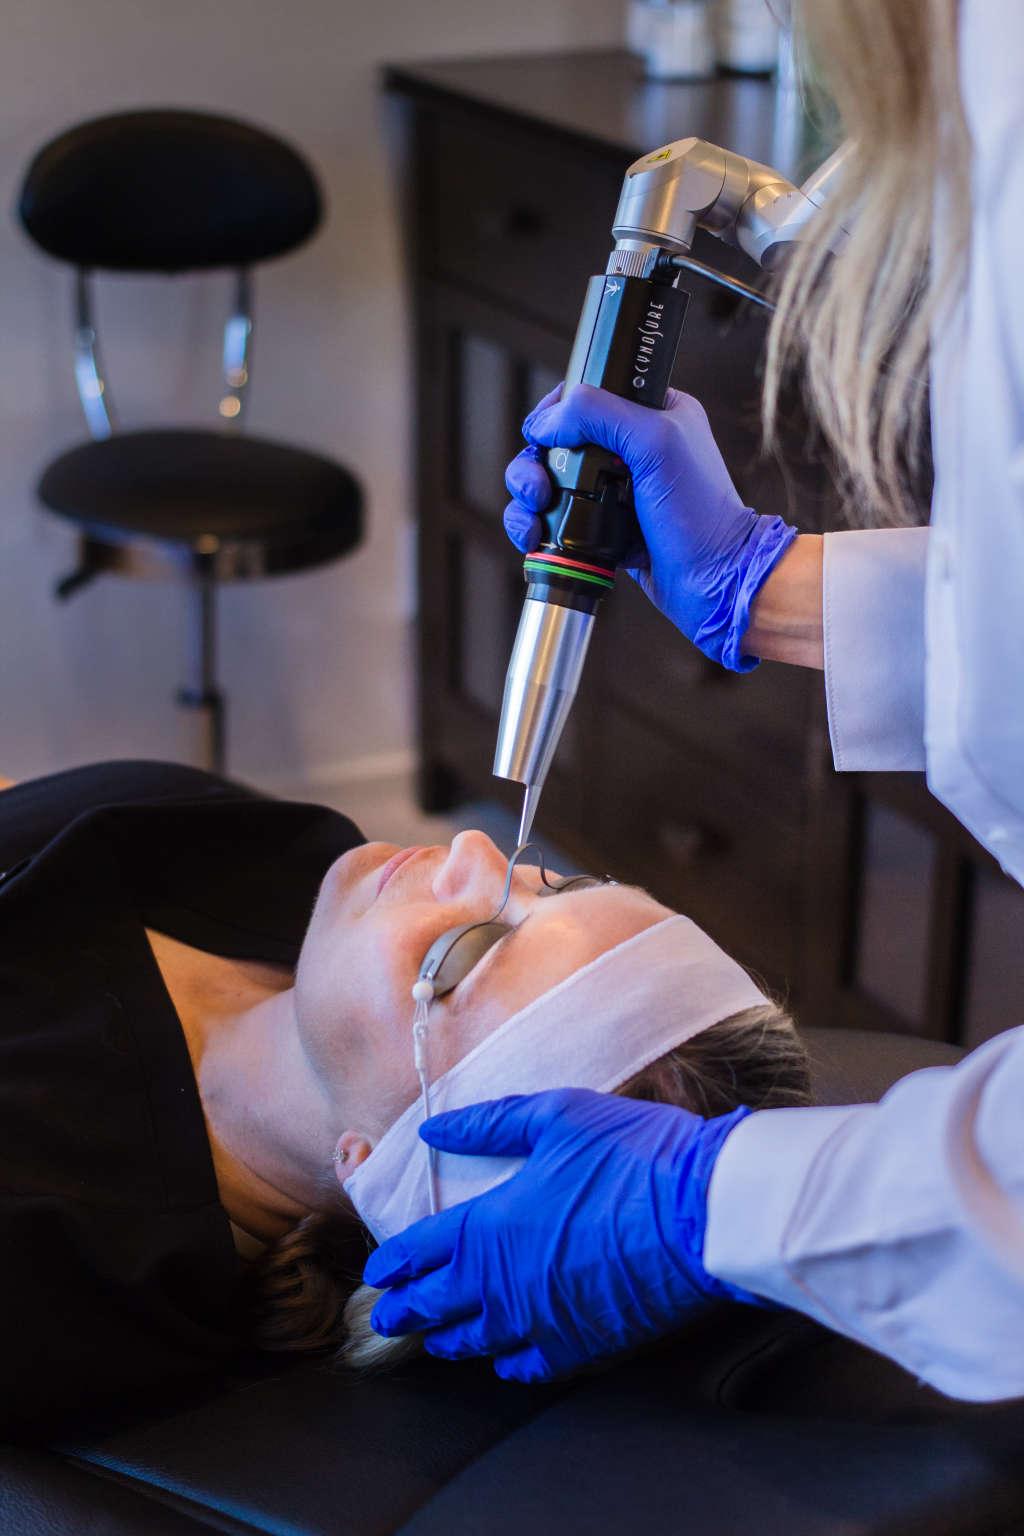 The Laser Skin Rejuvenation Treatment